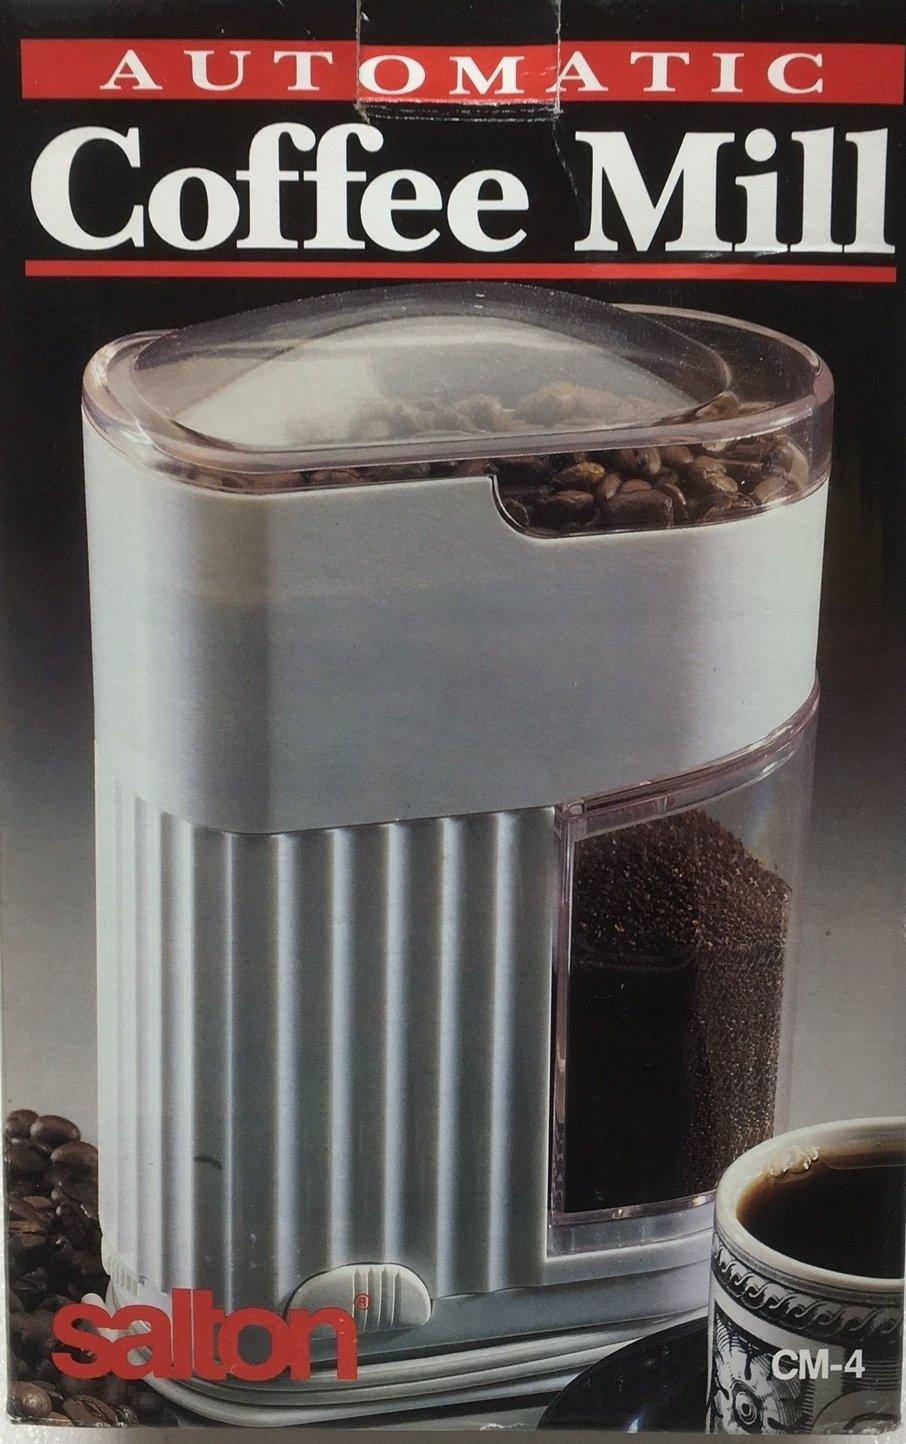 Salton Maxim Automatic Coffee Mill CM-4